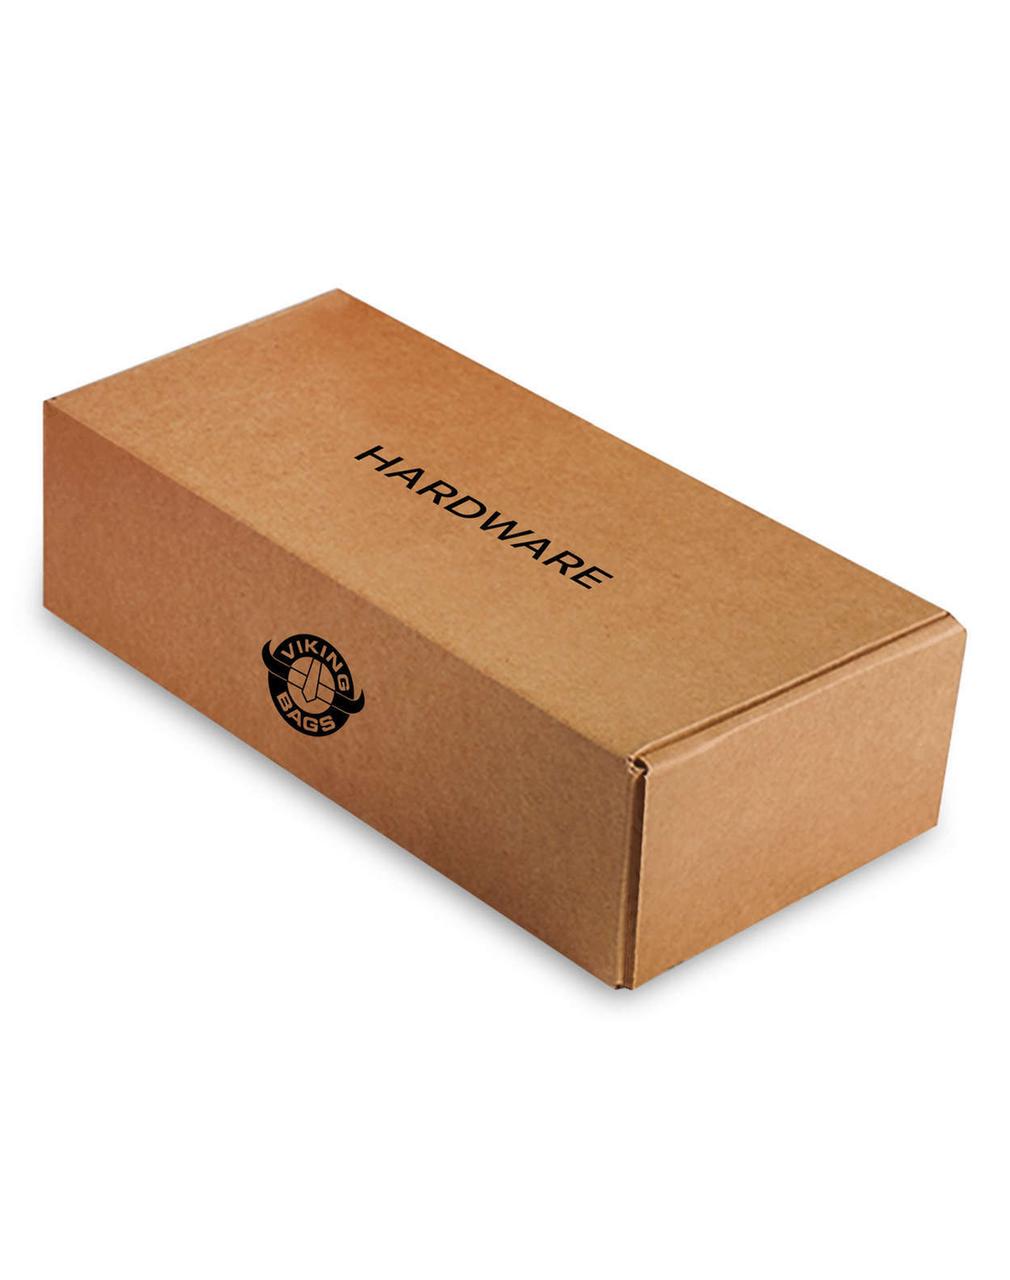 Kawasaki Vulcan S ABS Cafe Viking Lamellar Large Leather Covered Hard Saddlebags Hardware Box